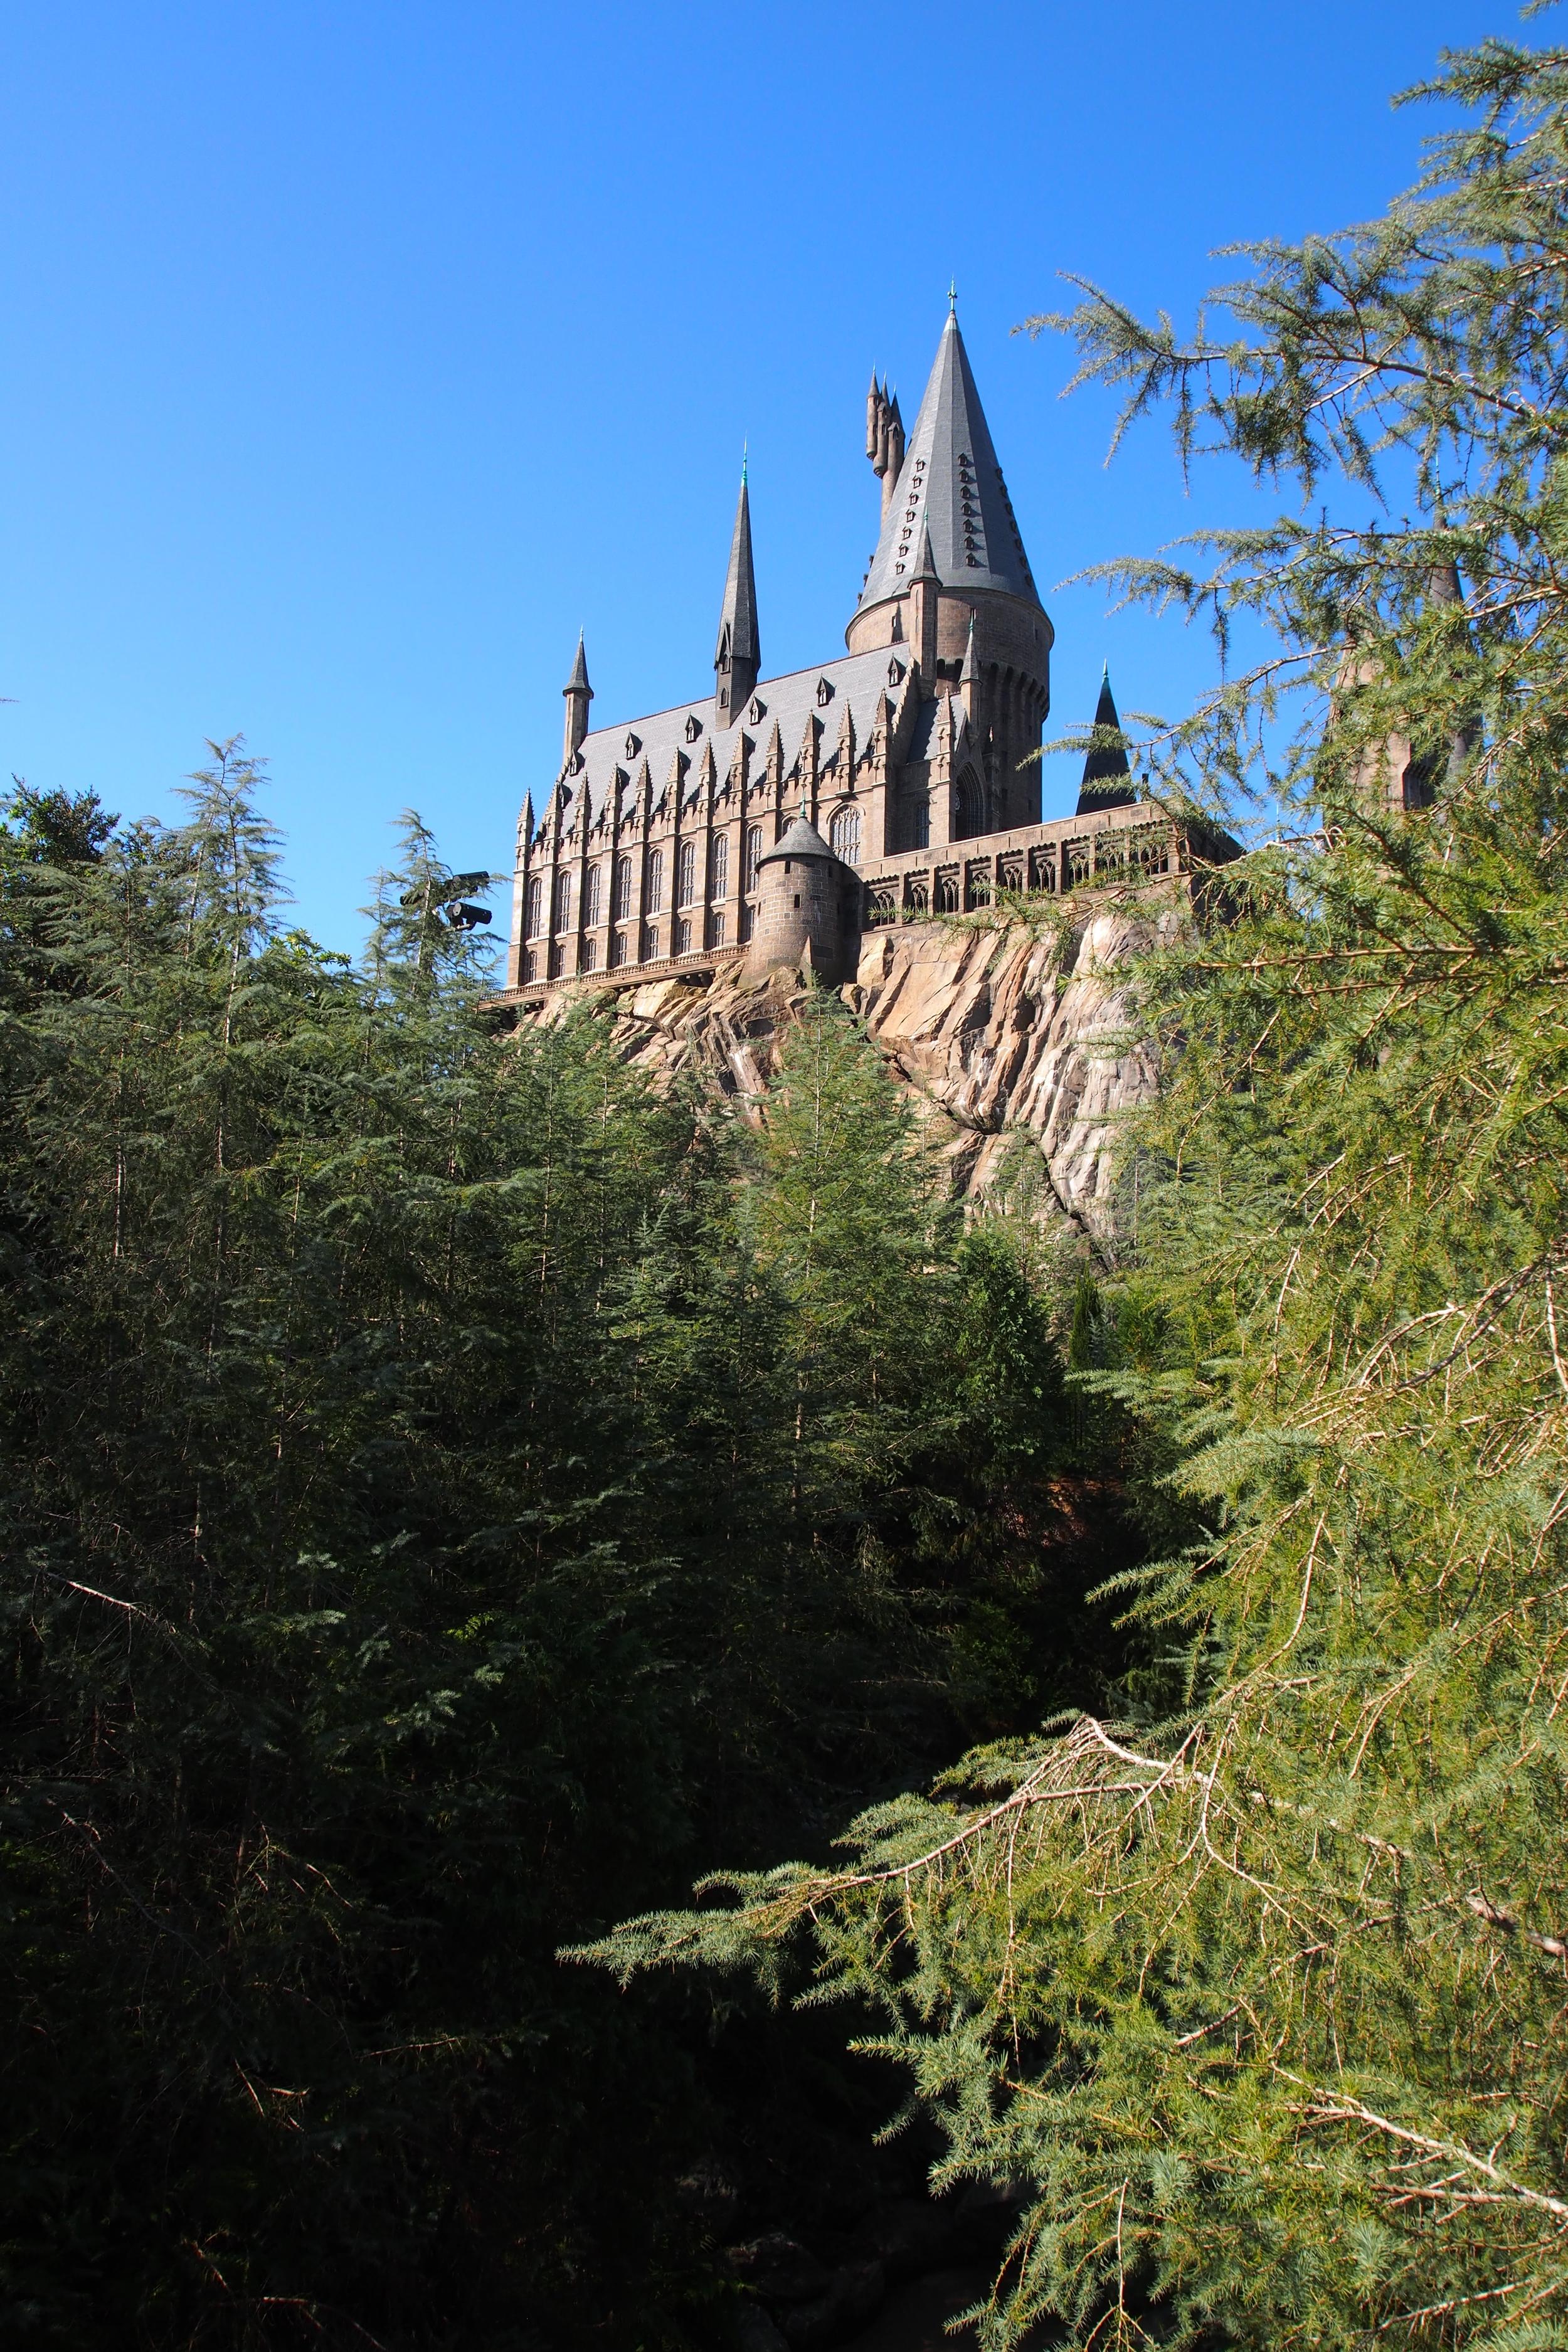 Hogwarts School from Harry Potter